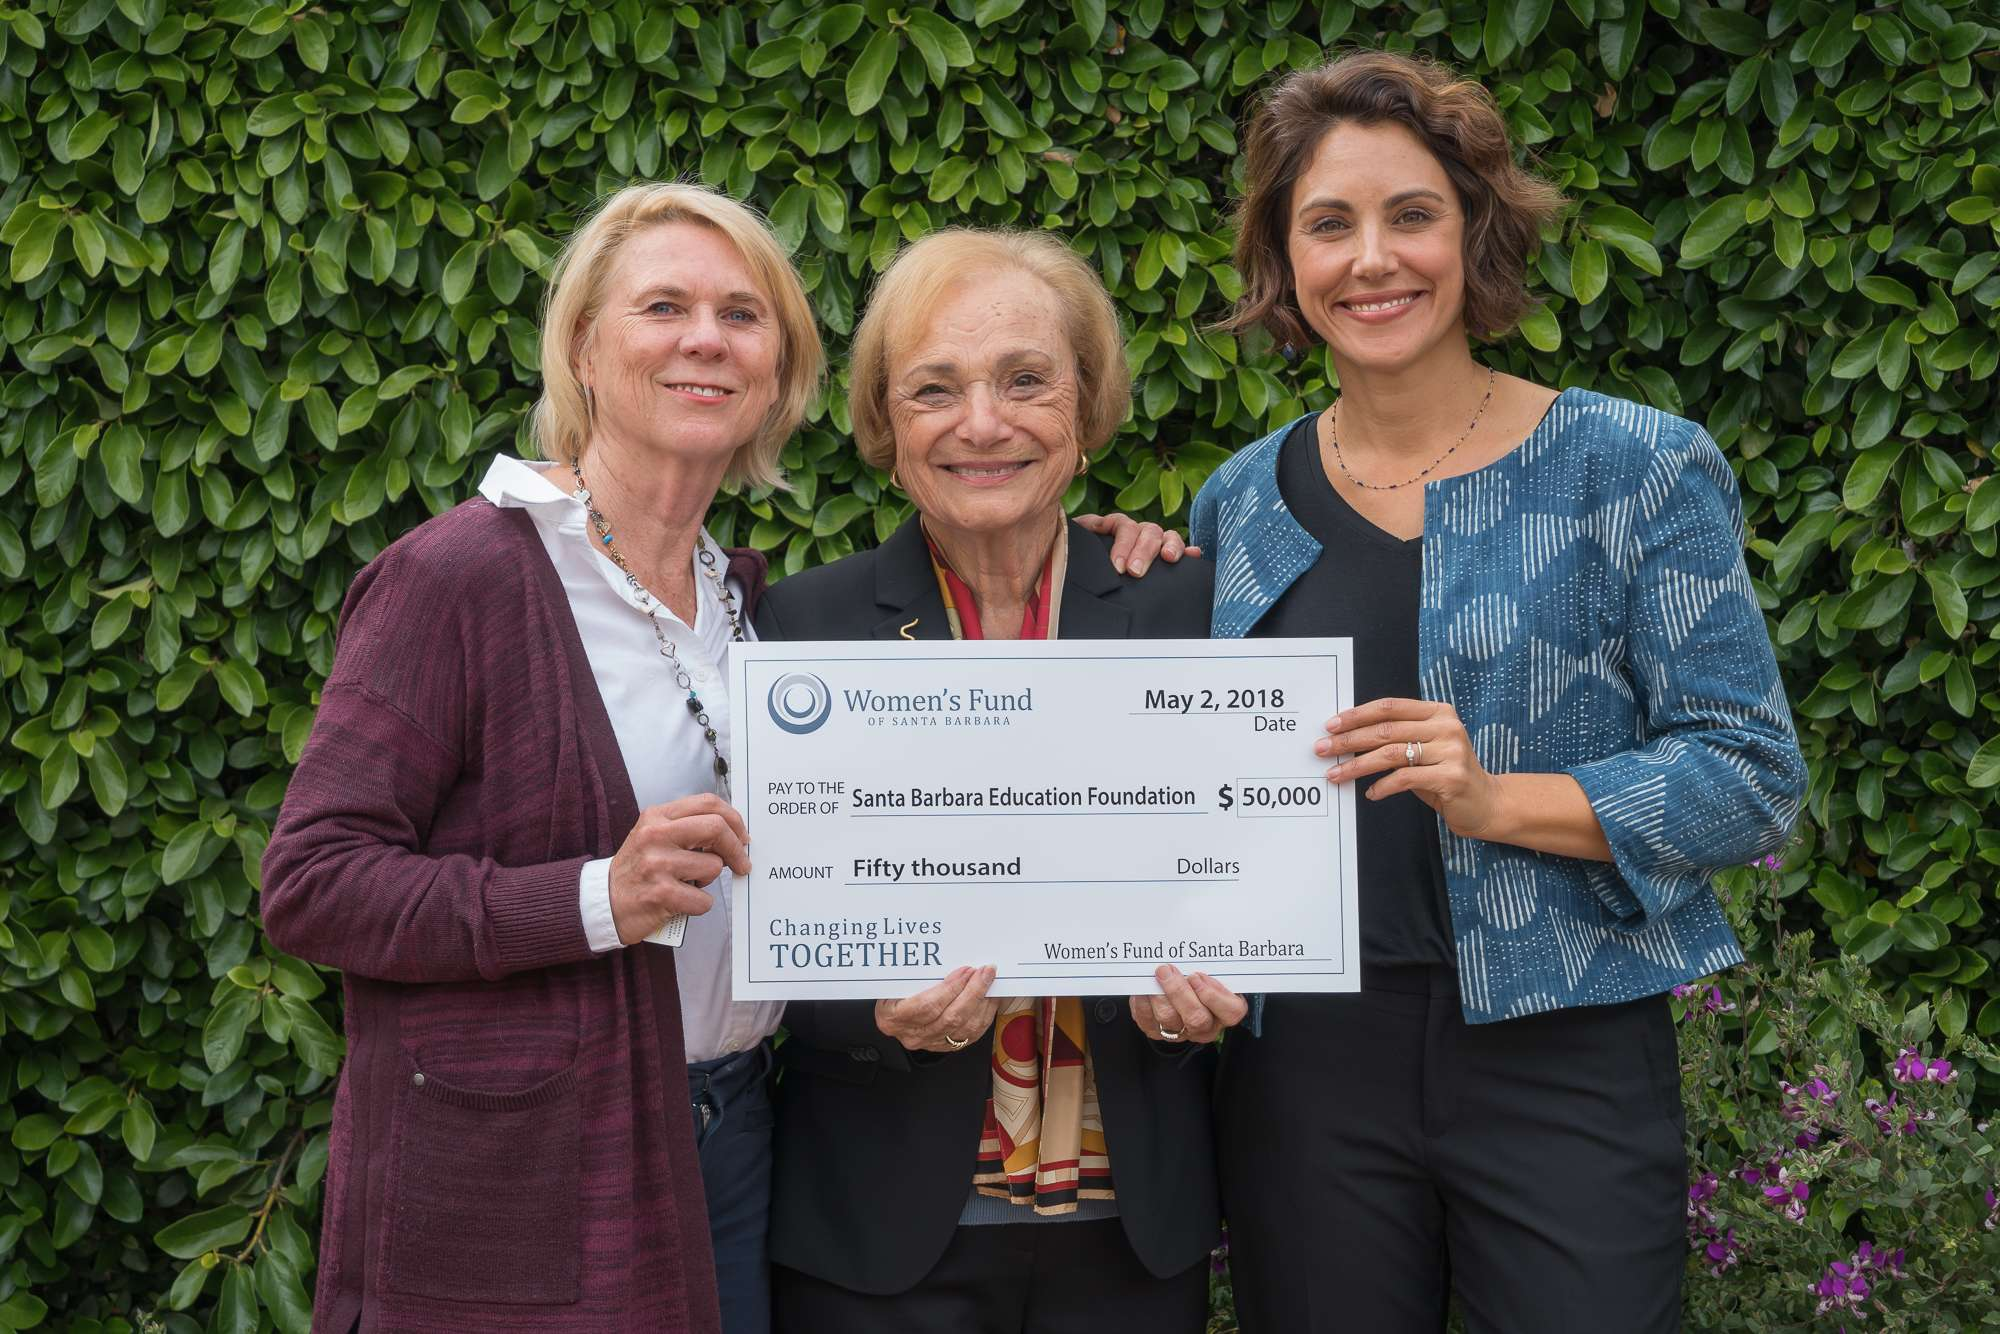 Santa Barbara Education Foundation awarded $50,000 for early reading intervention